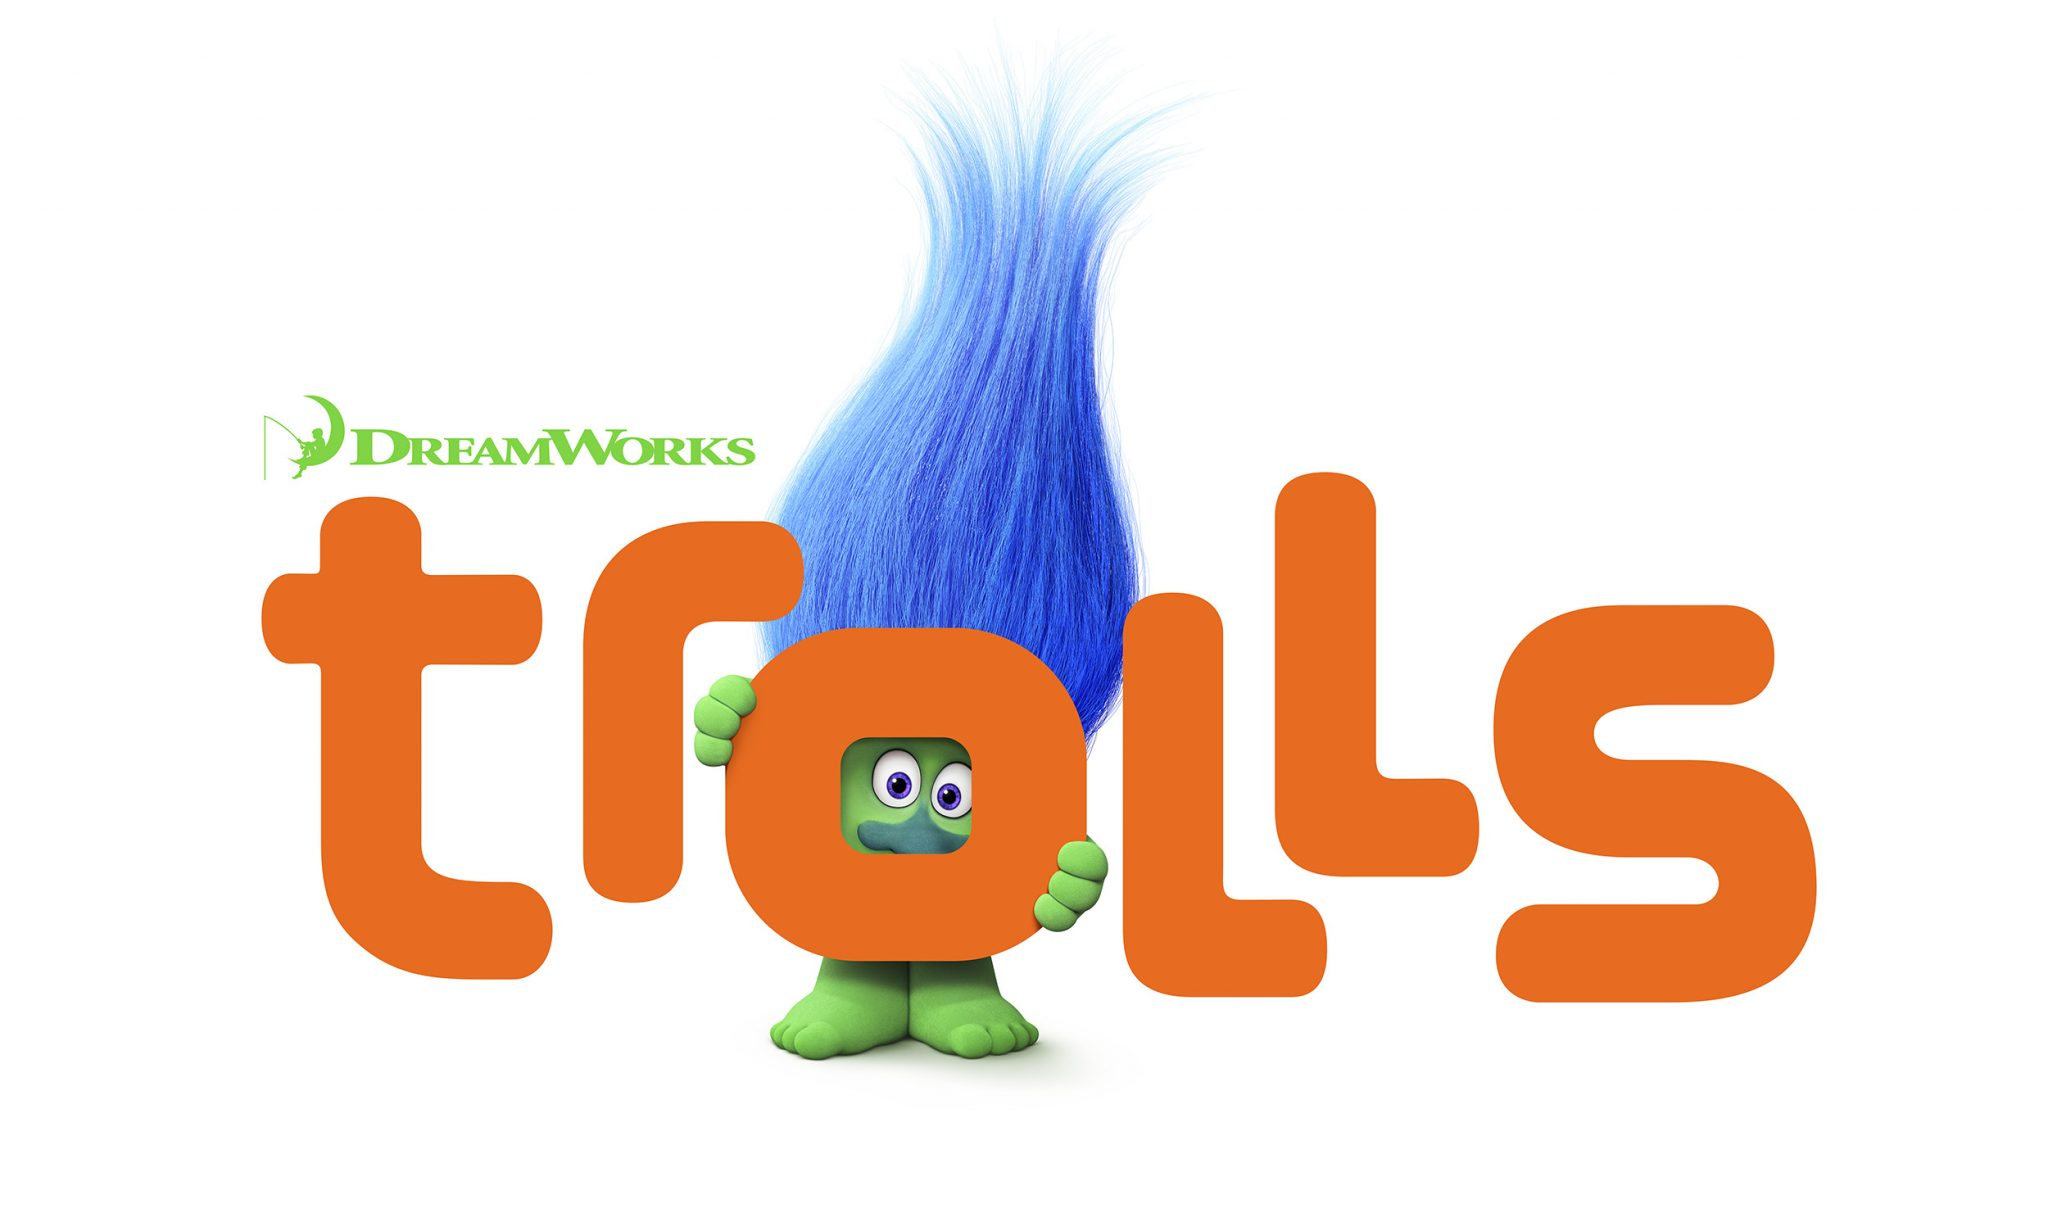 DreamWorks_Trolls